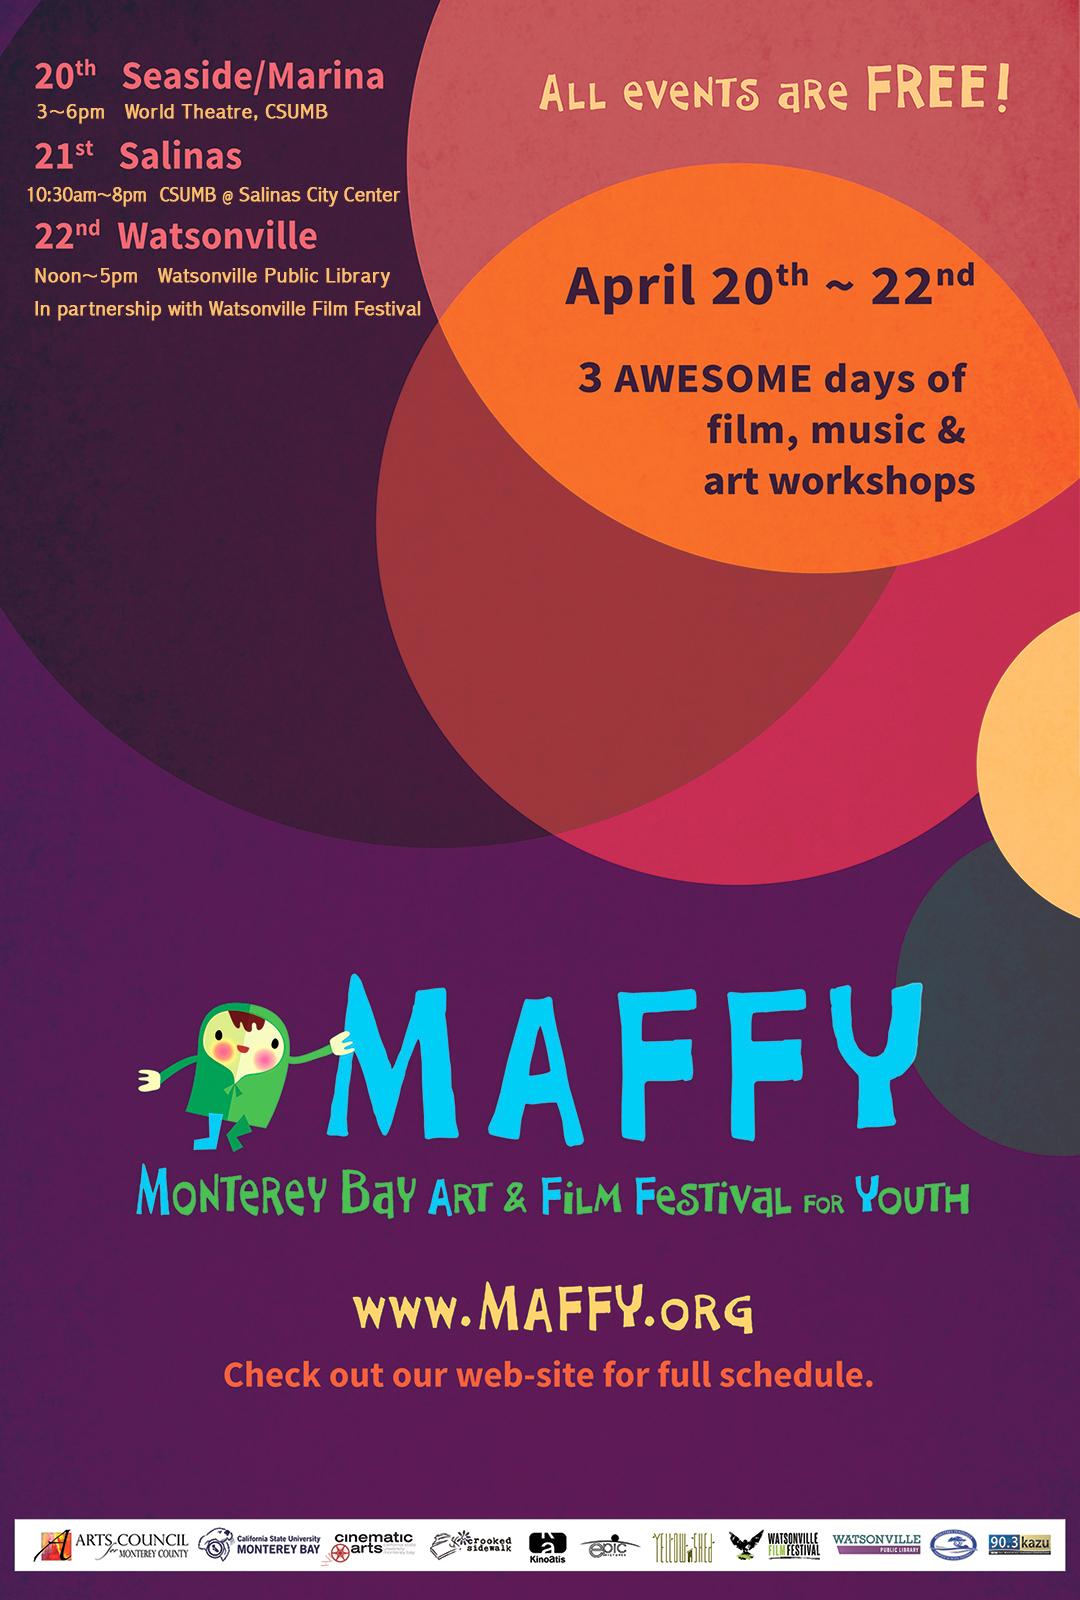 MAFFY17_Poster_web2.jpg